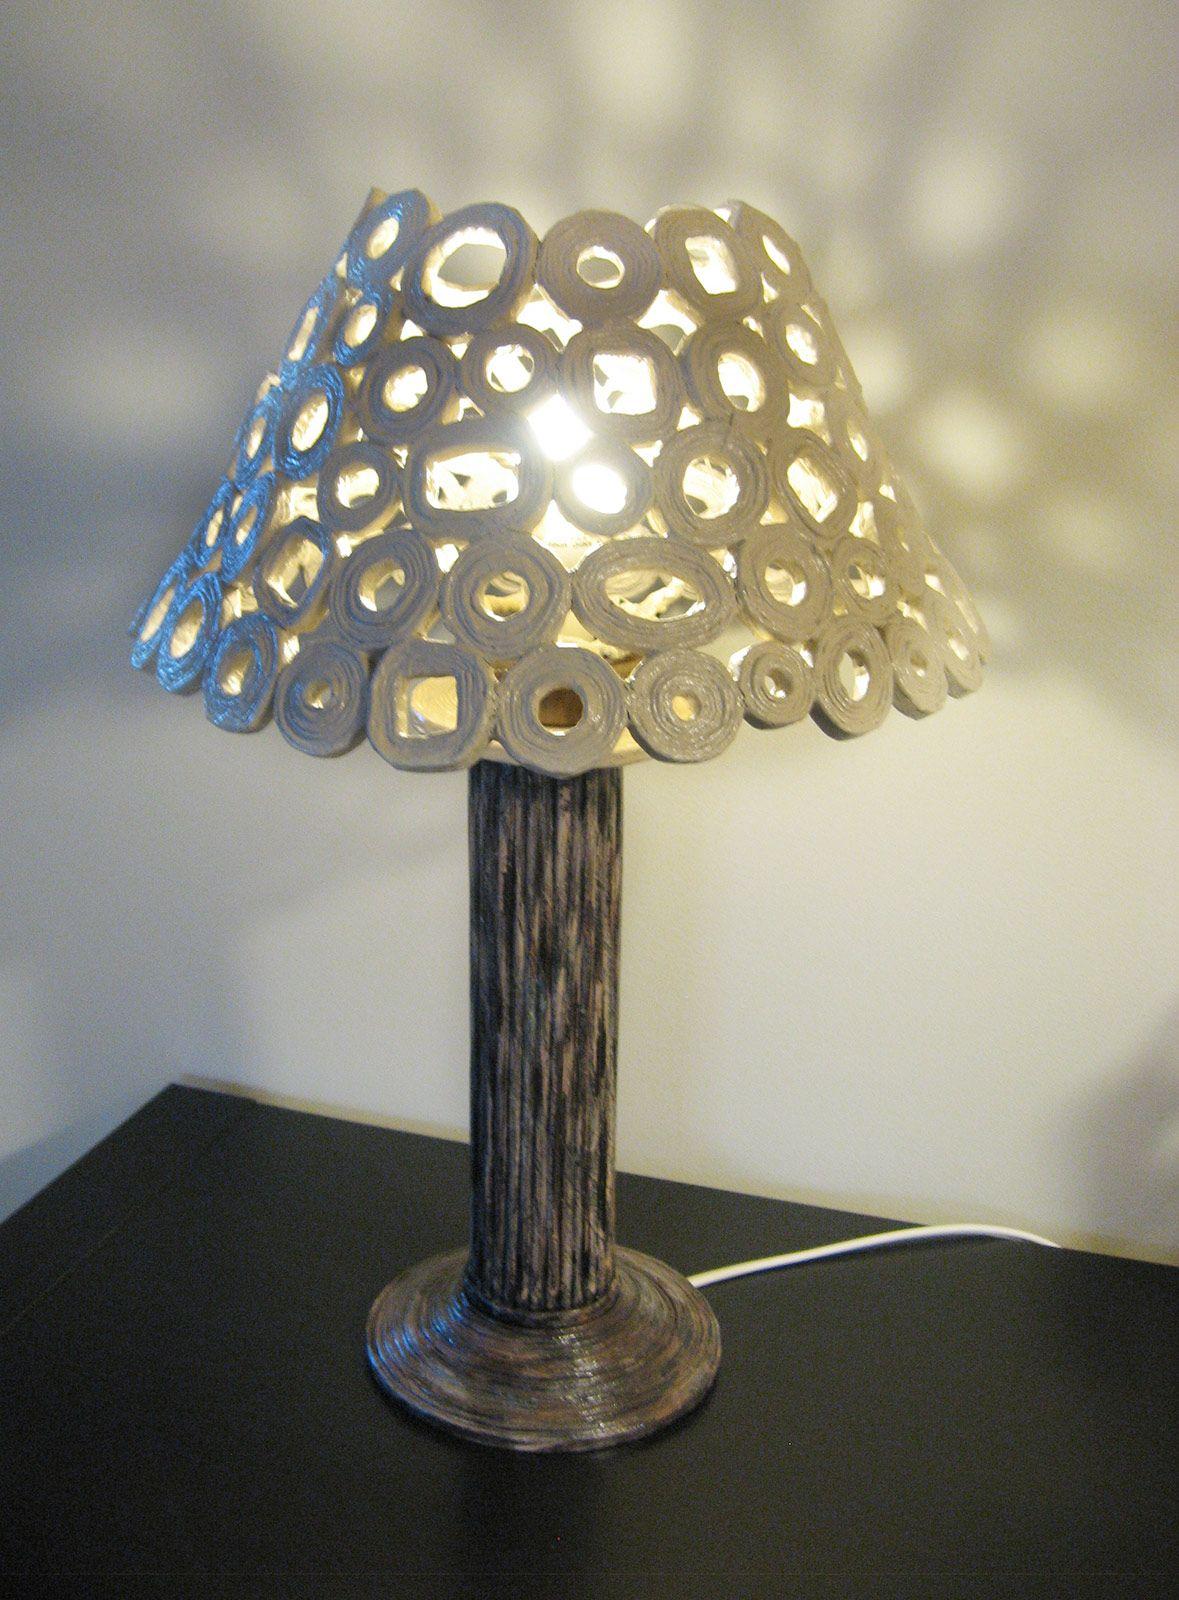 Lampada Da Tavolo Paralume Con Carta Da Riciclo Cose Di Casa Abat Jour Fai Da Te Lampade Da Tavolo Lampade Da Terra Fai Da Te